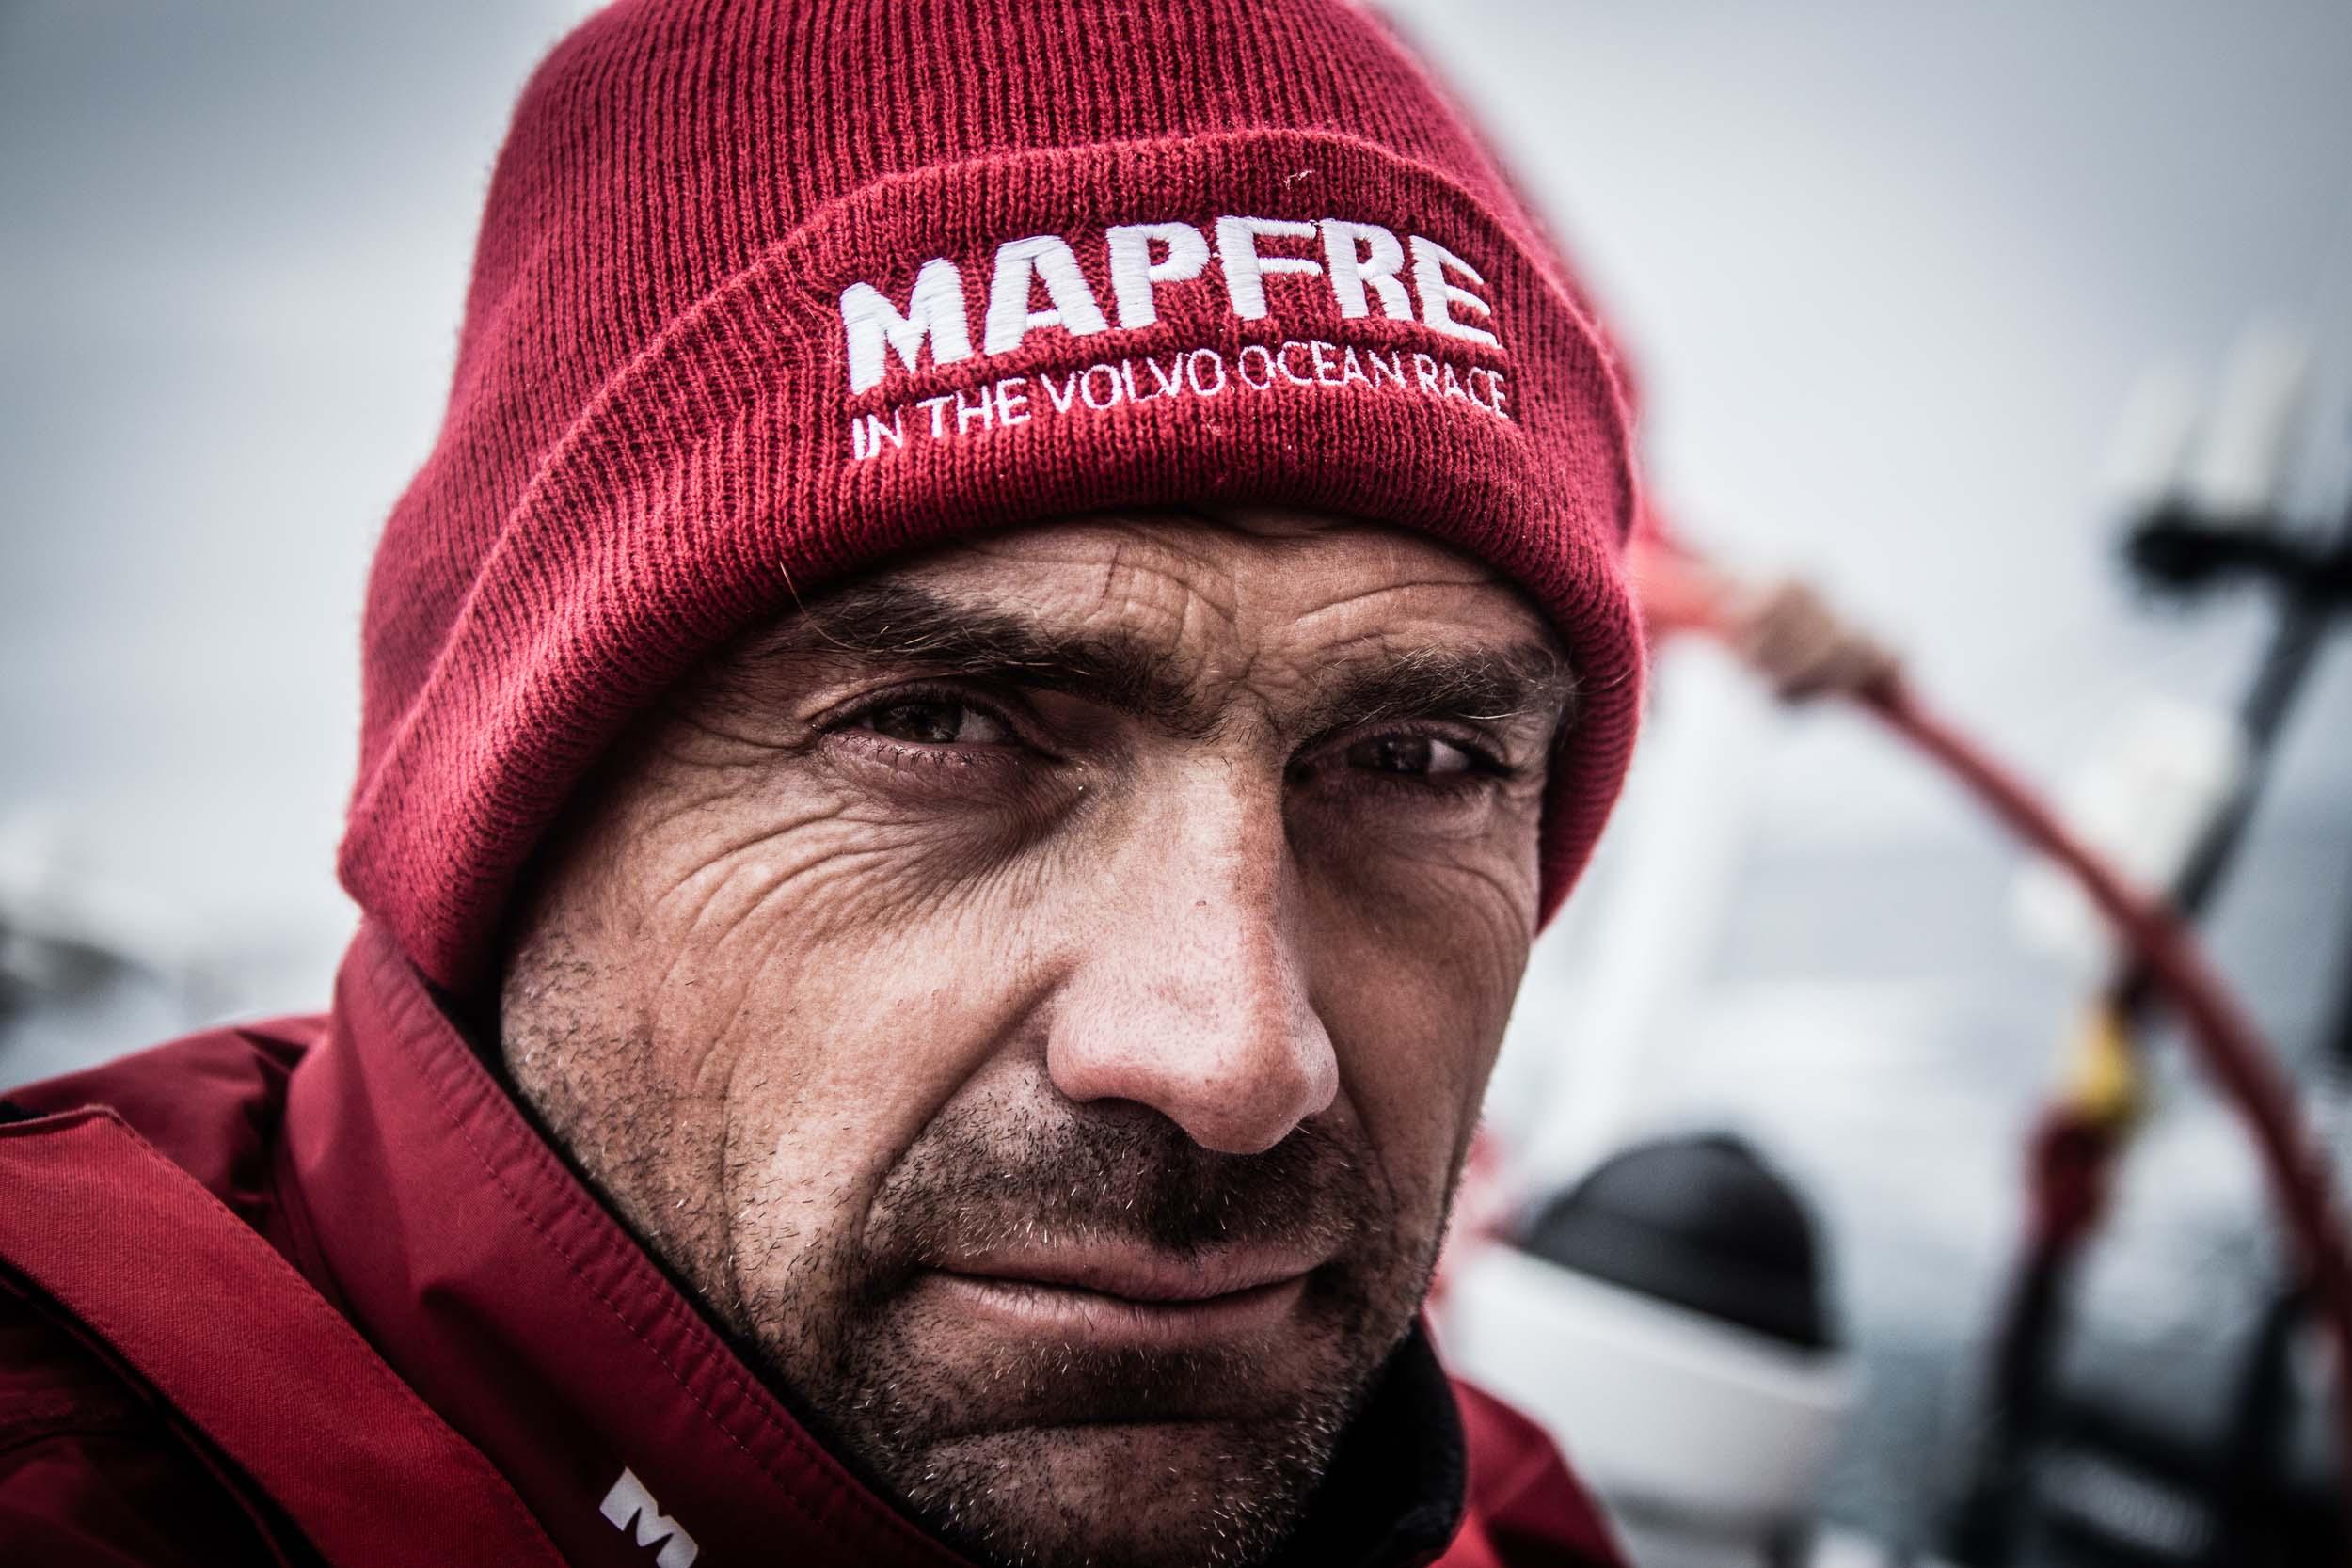 Volvo Ocean Race 2014 - 15 Leg 9 to Gothemburg